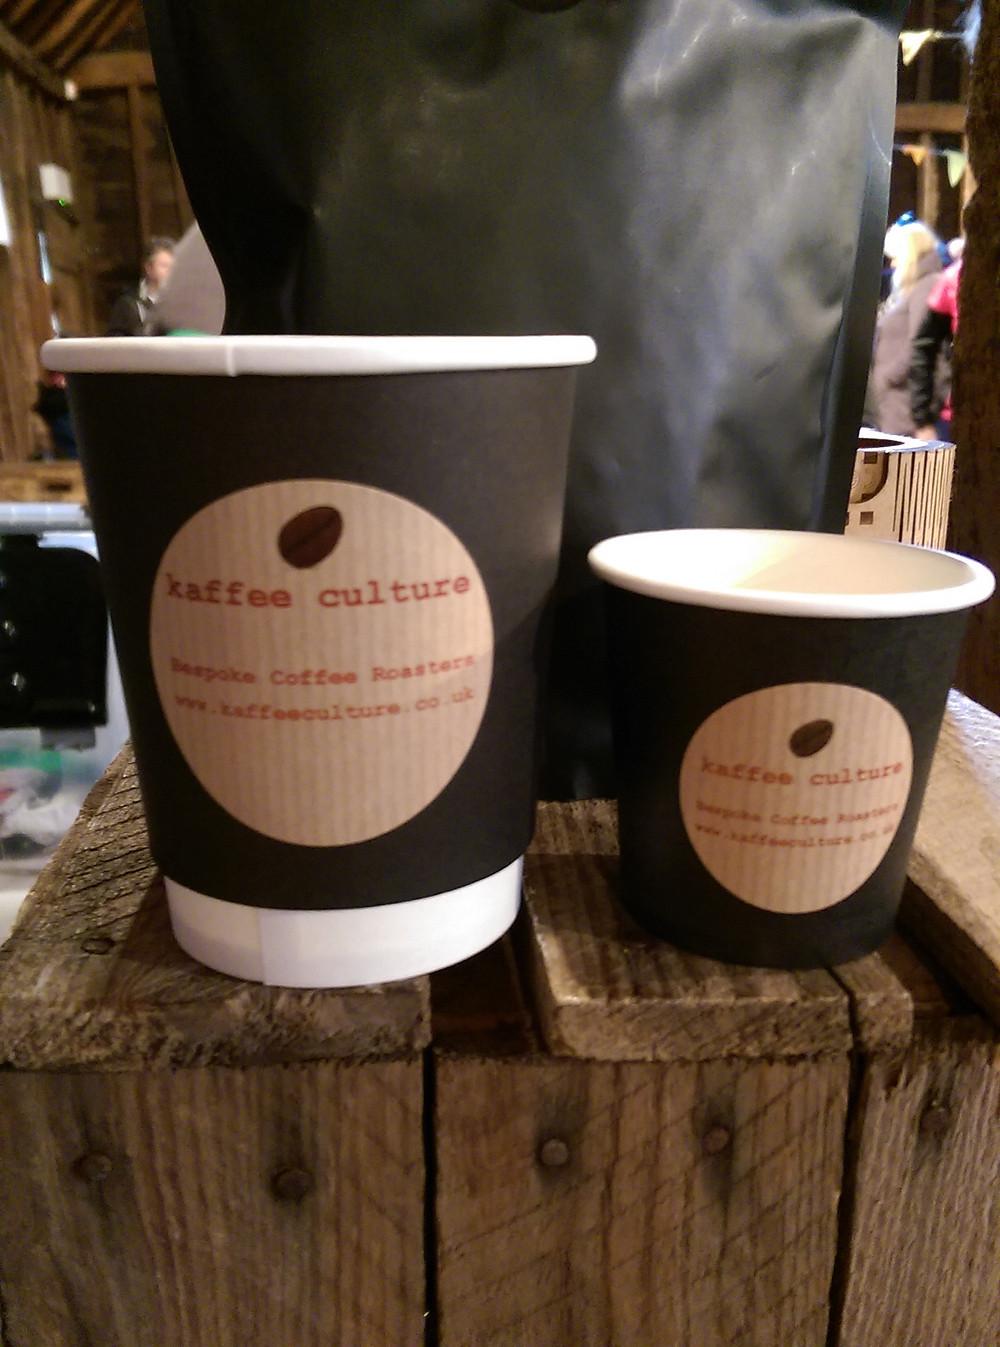 Kaffee Culture Espresso cups